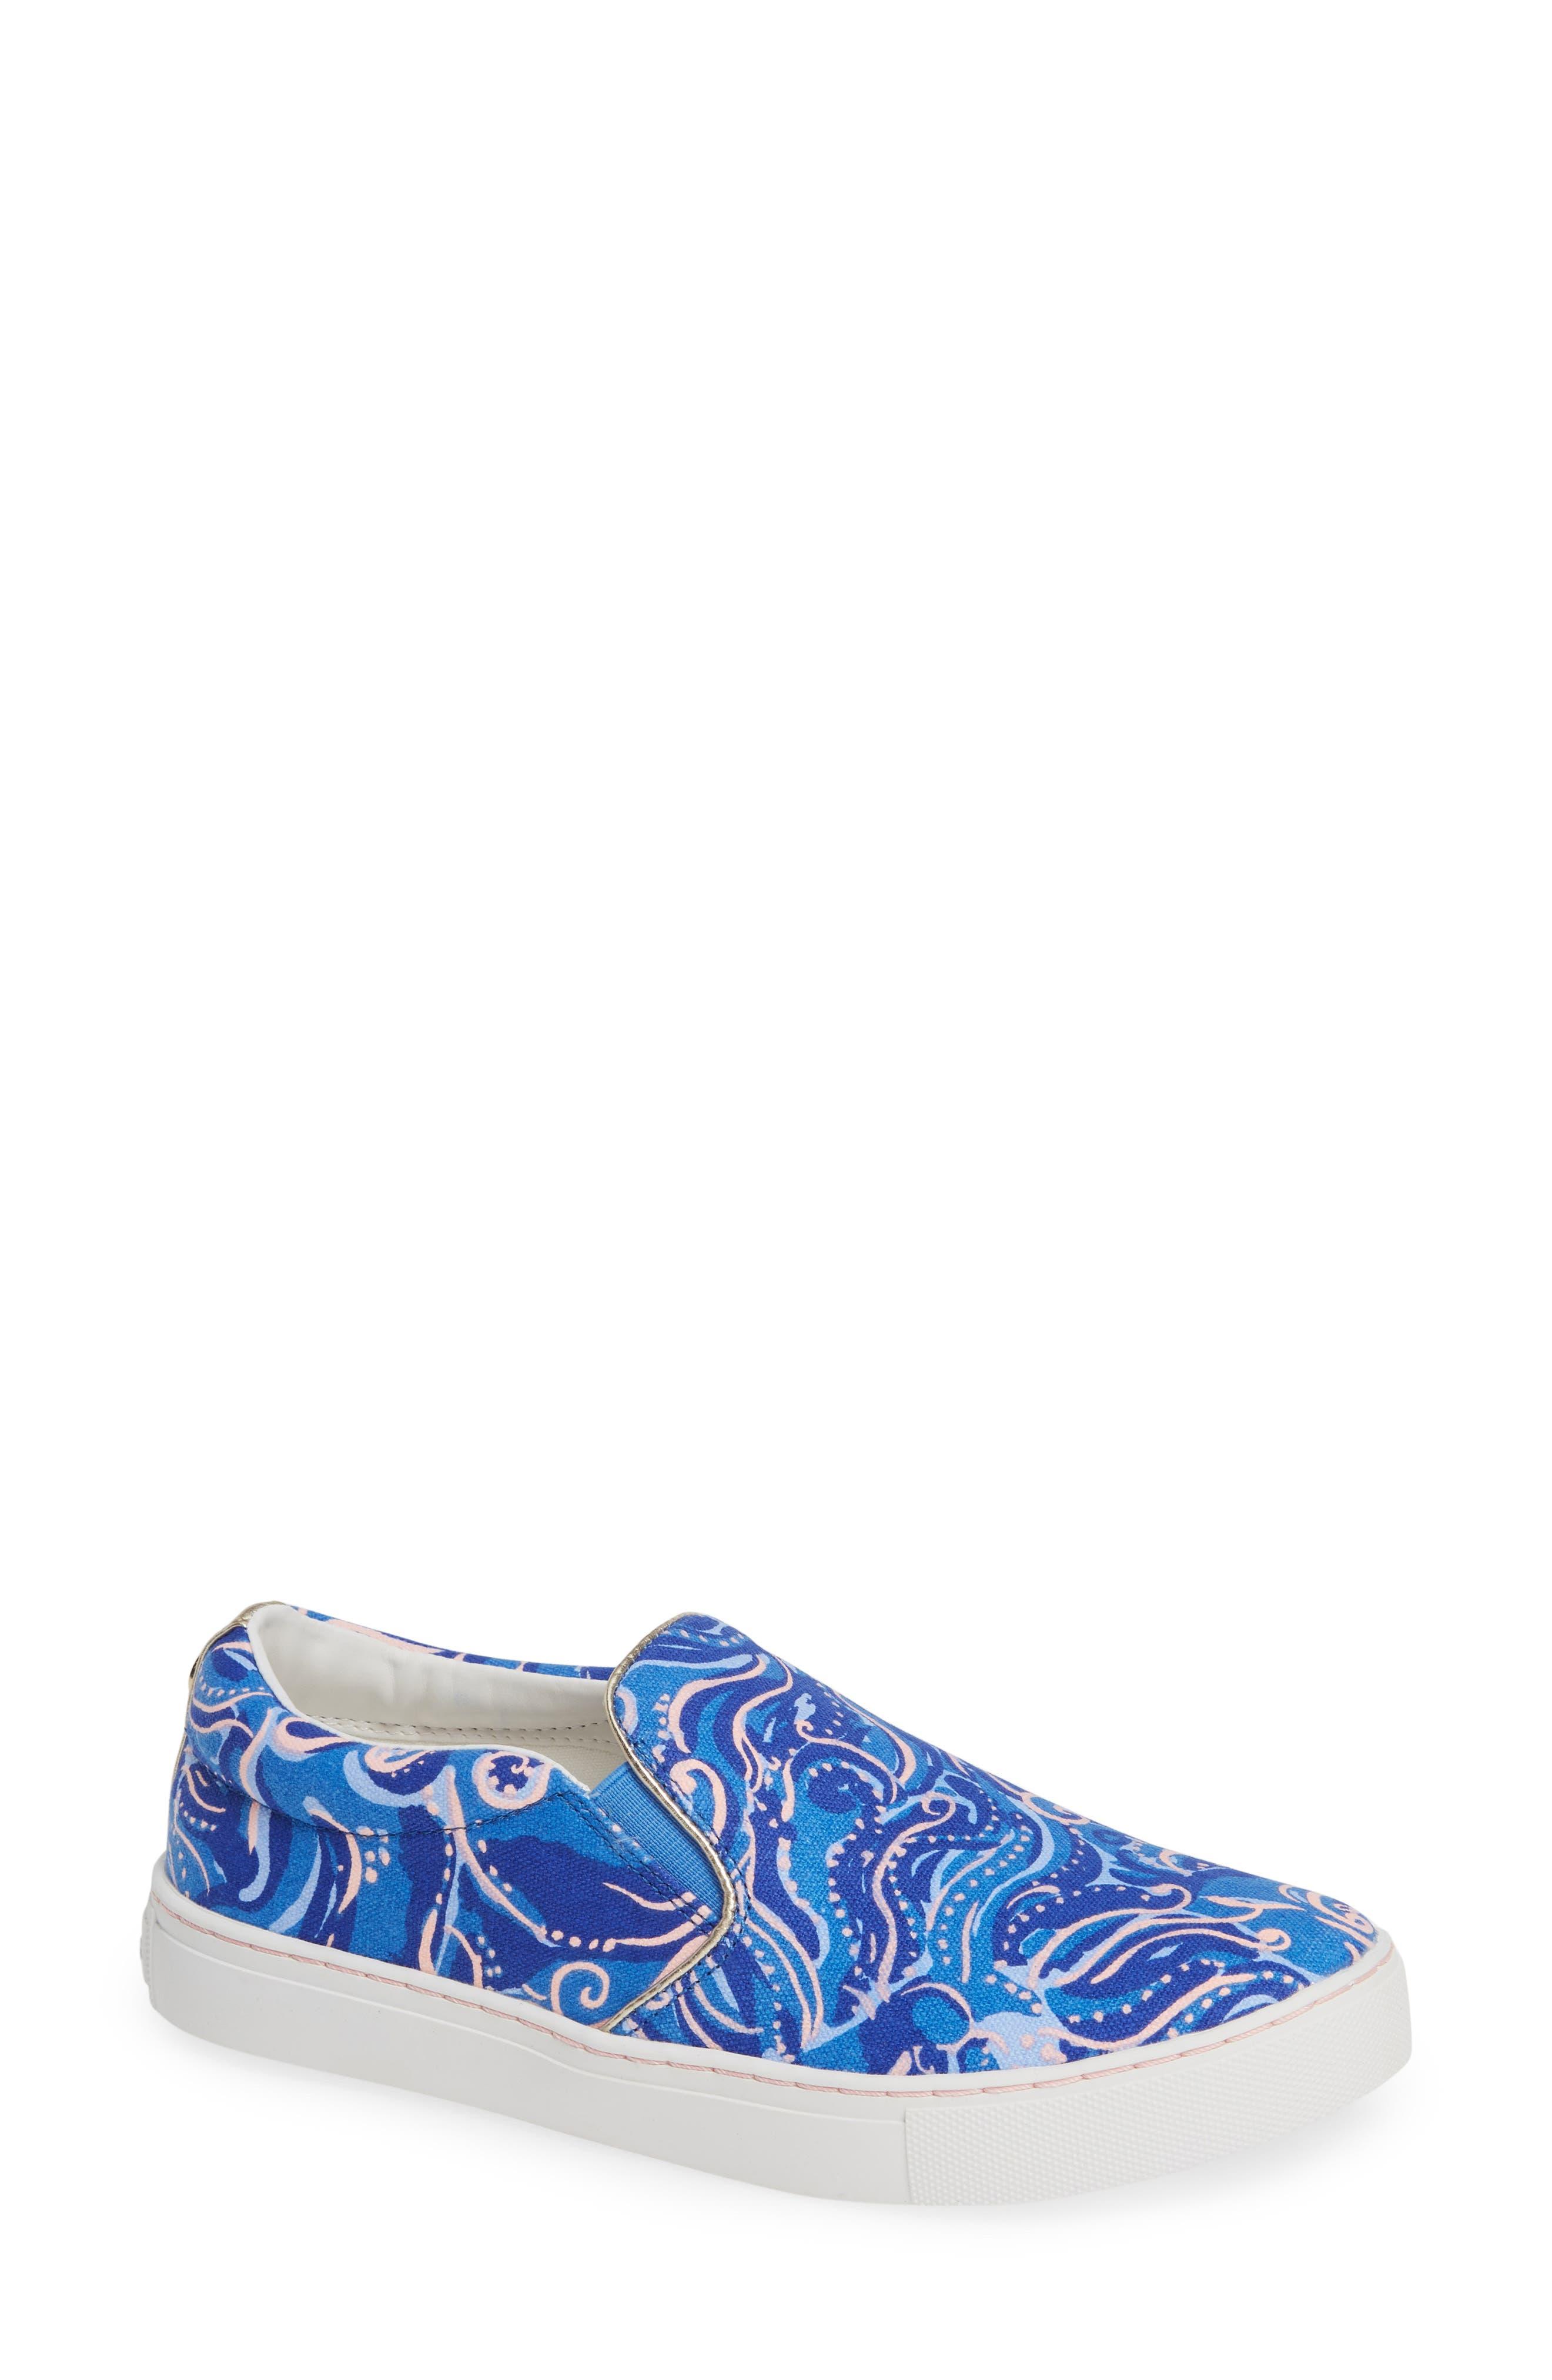 Julie Sneaker,                             Main thumbnail 1, color,                             COASTAL BLUE